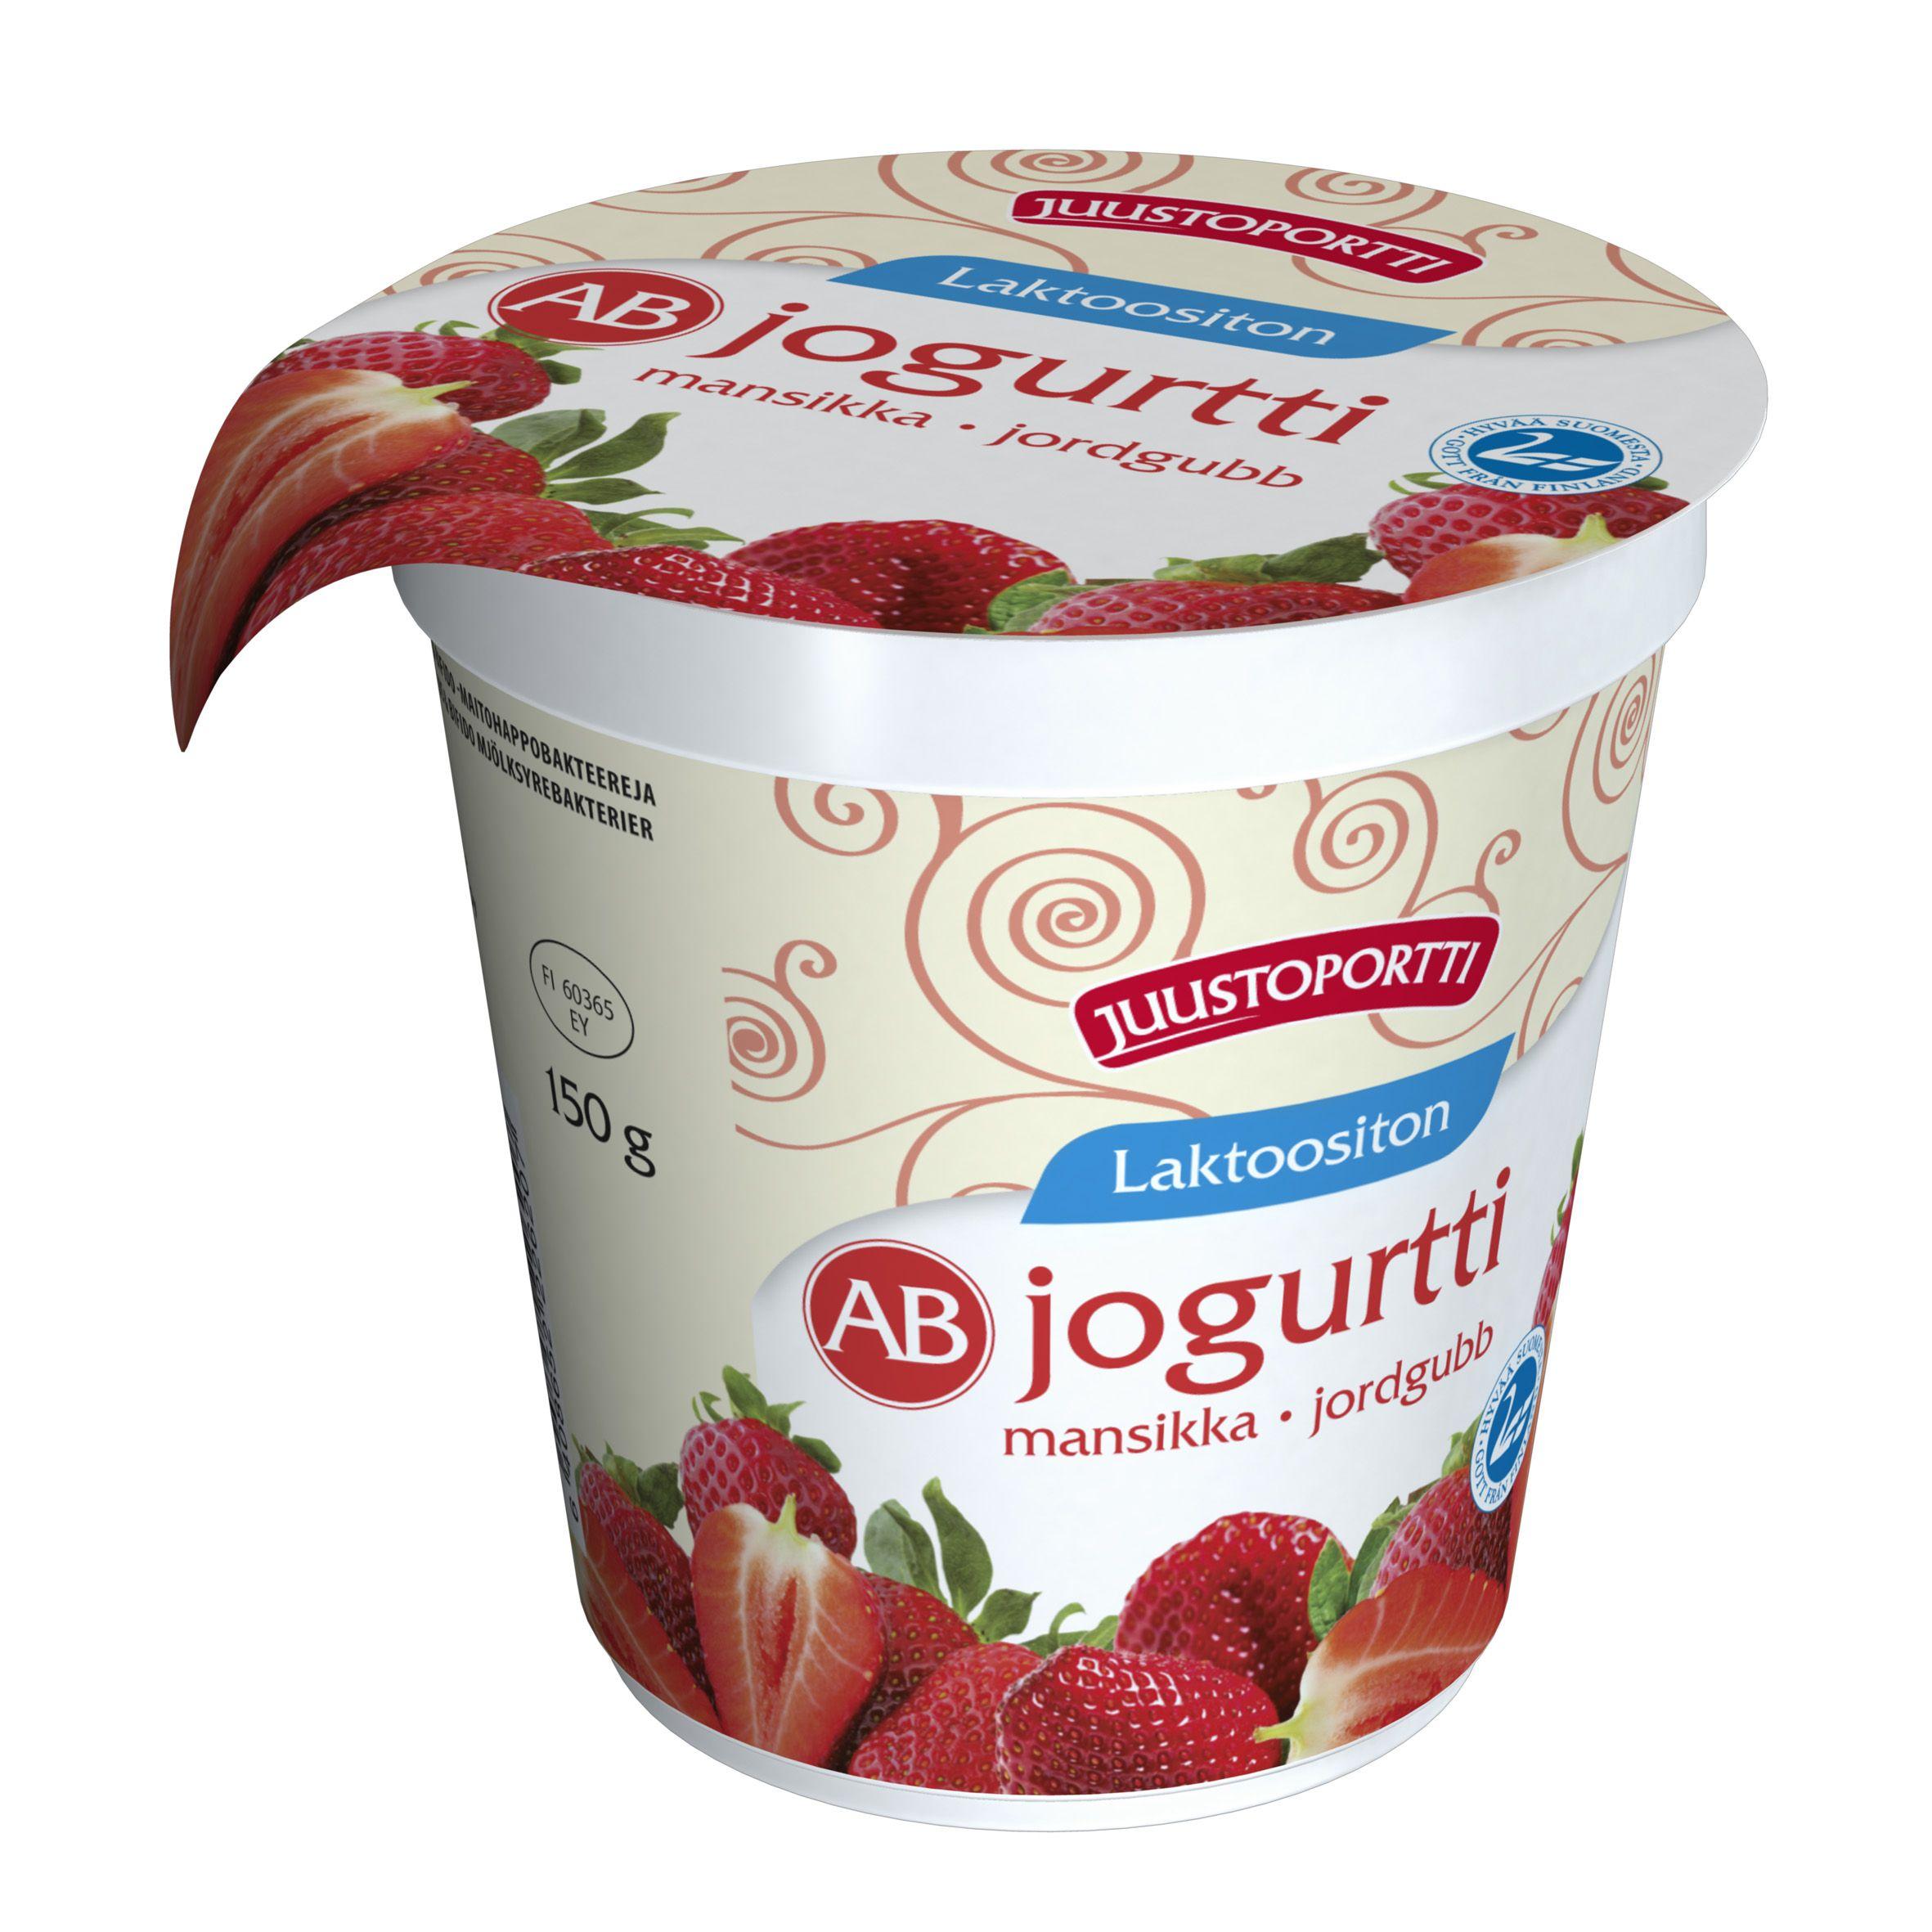 Laktoositon ab-jogurtti Mansikka 150g